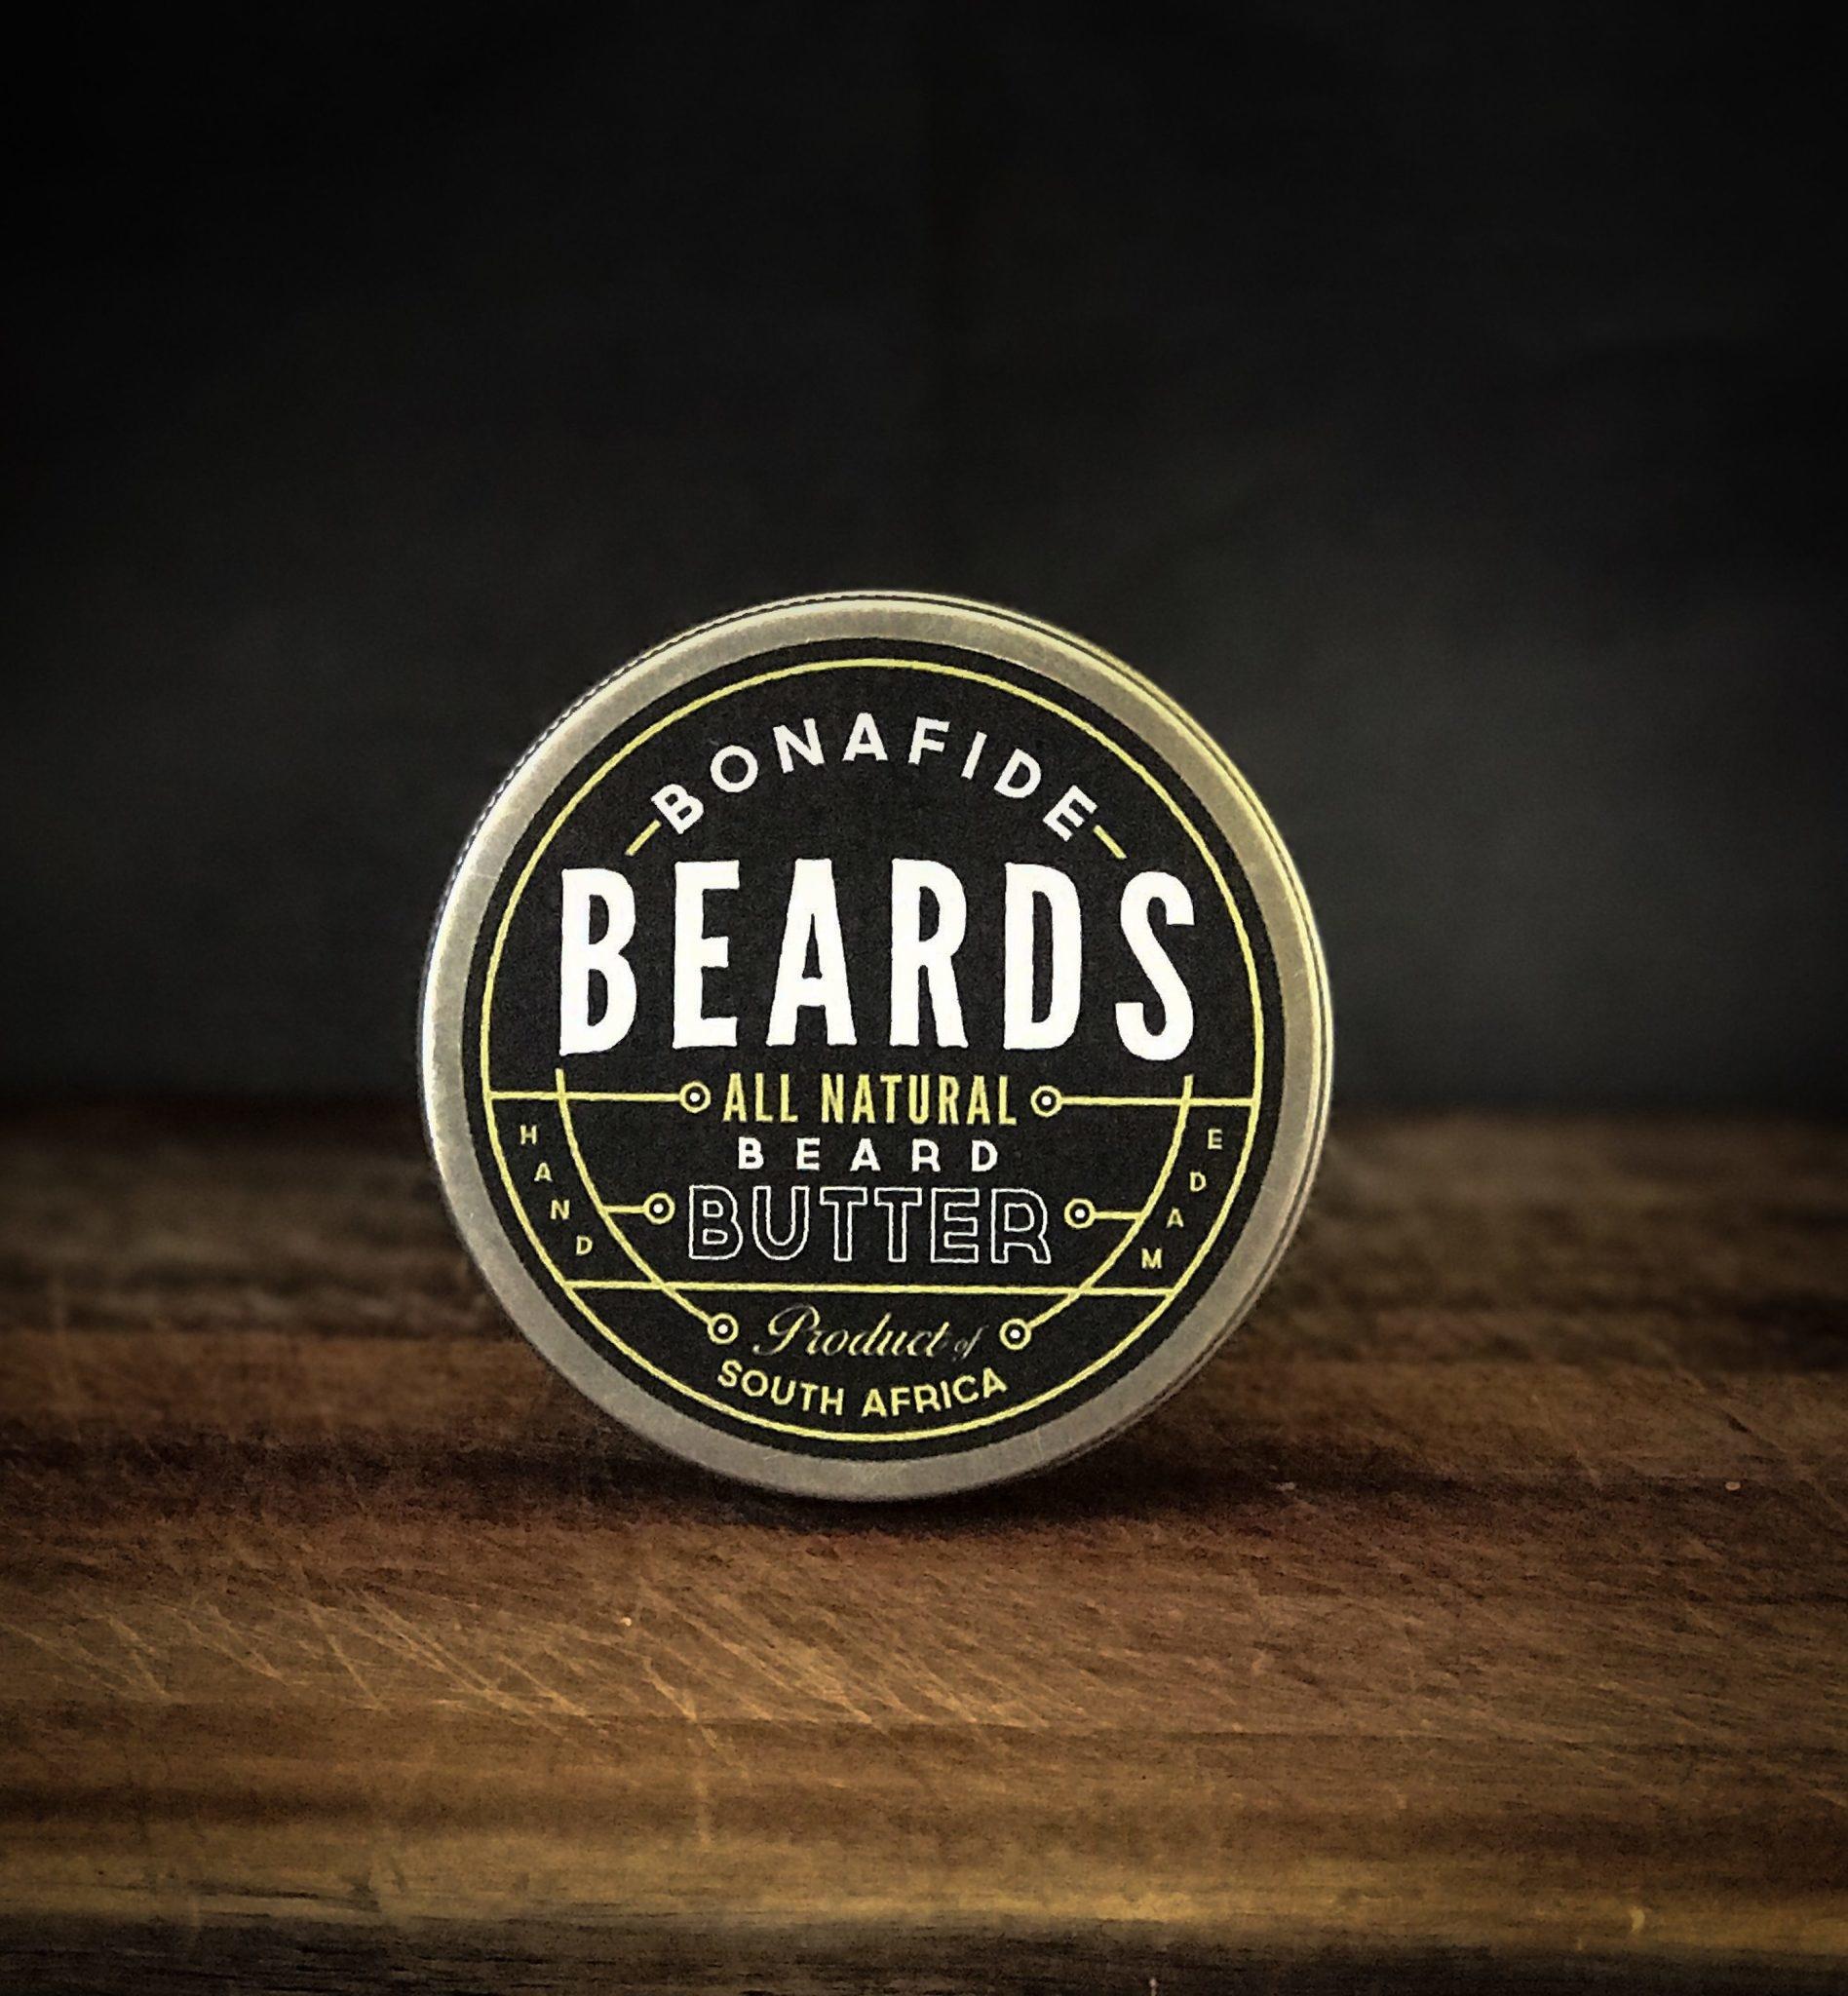 Bonafide Beards Beard Butter